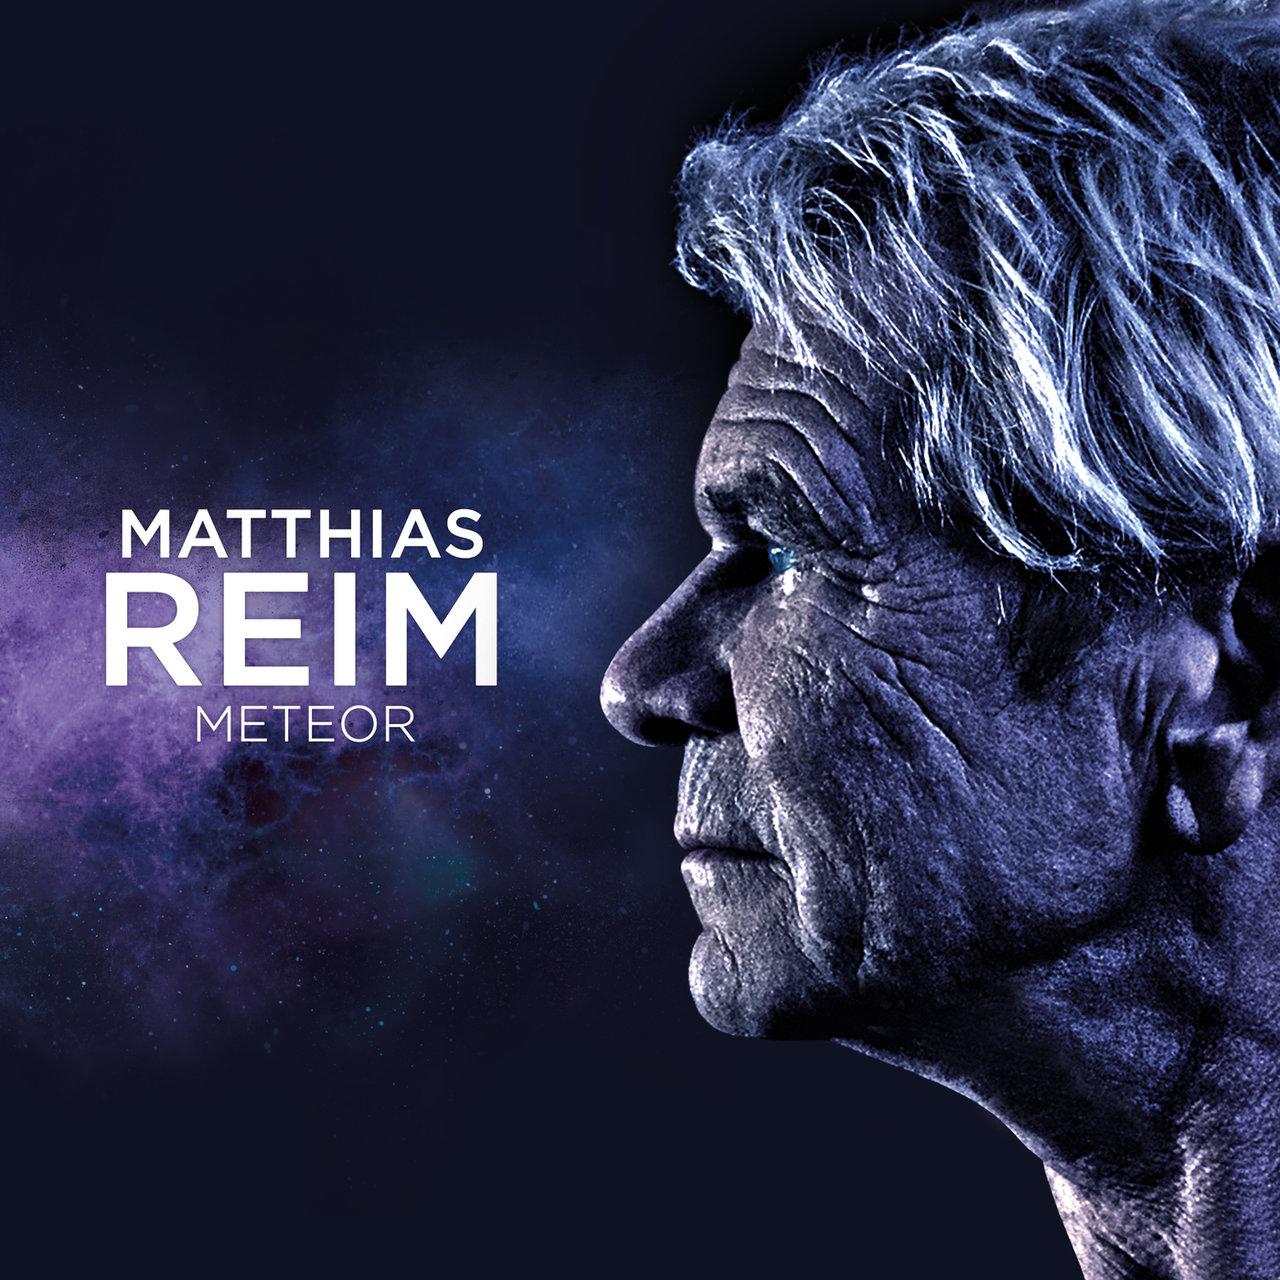 Listen To Meteor By Matthias Reim On Tidal